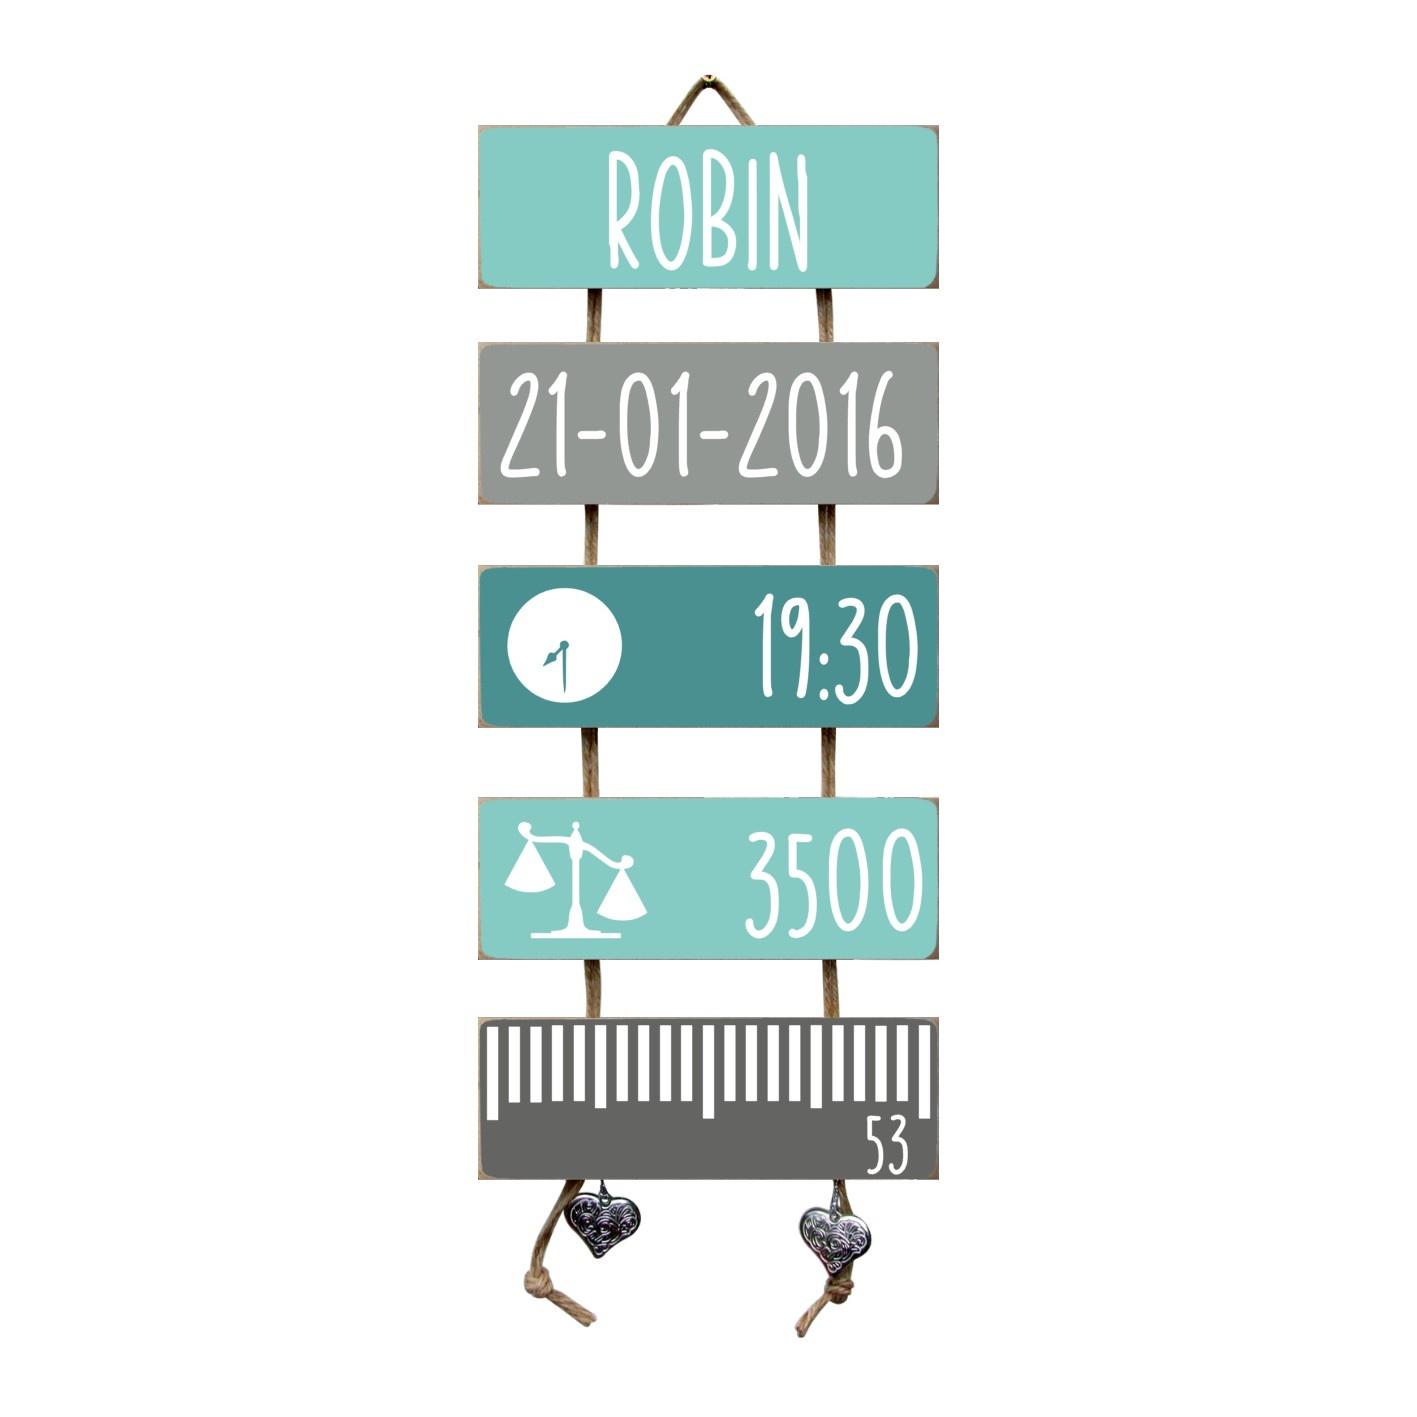 Kraamcadeau Geboorteladder Robin mint/grijs